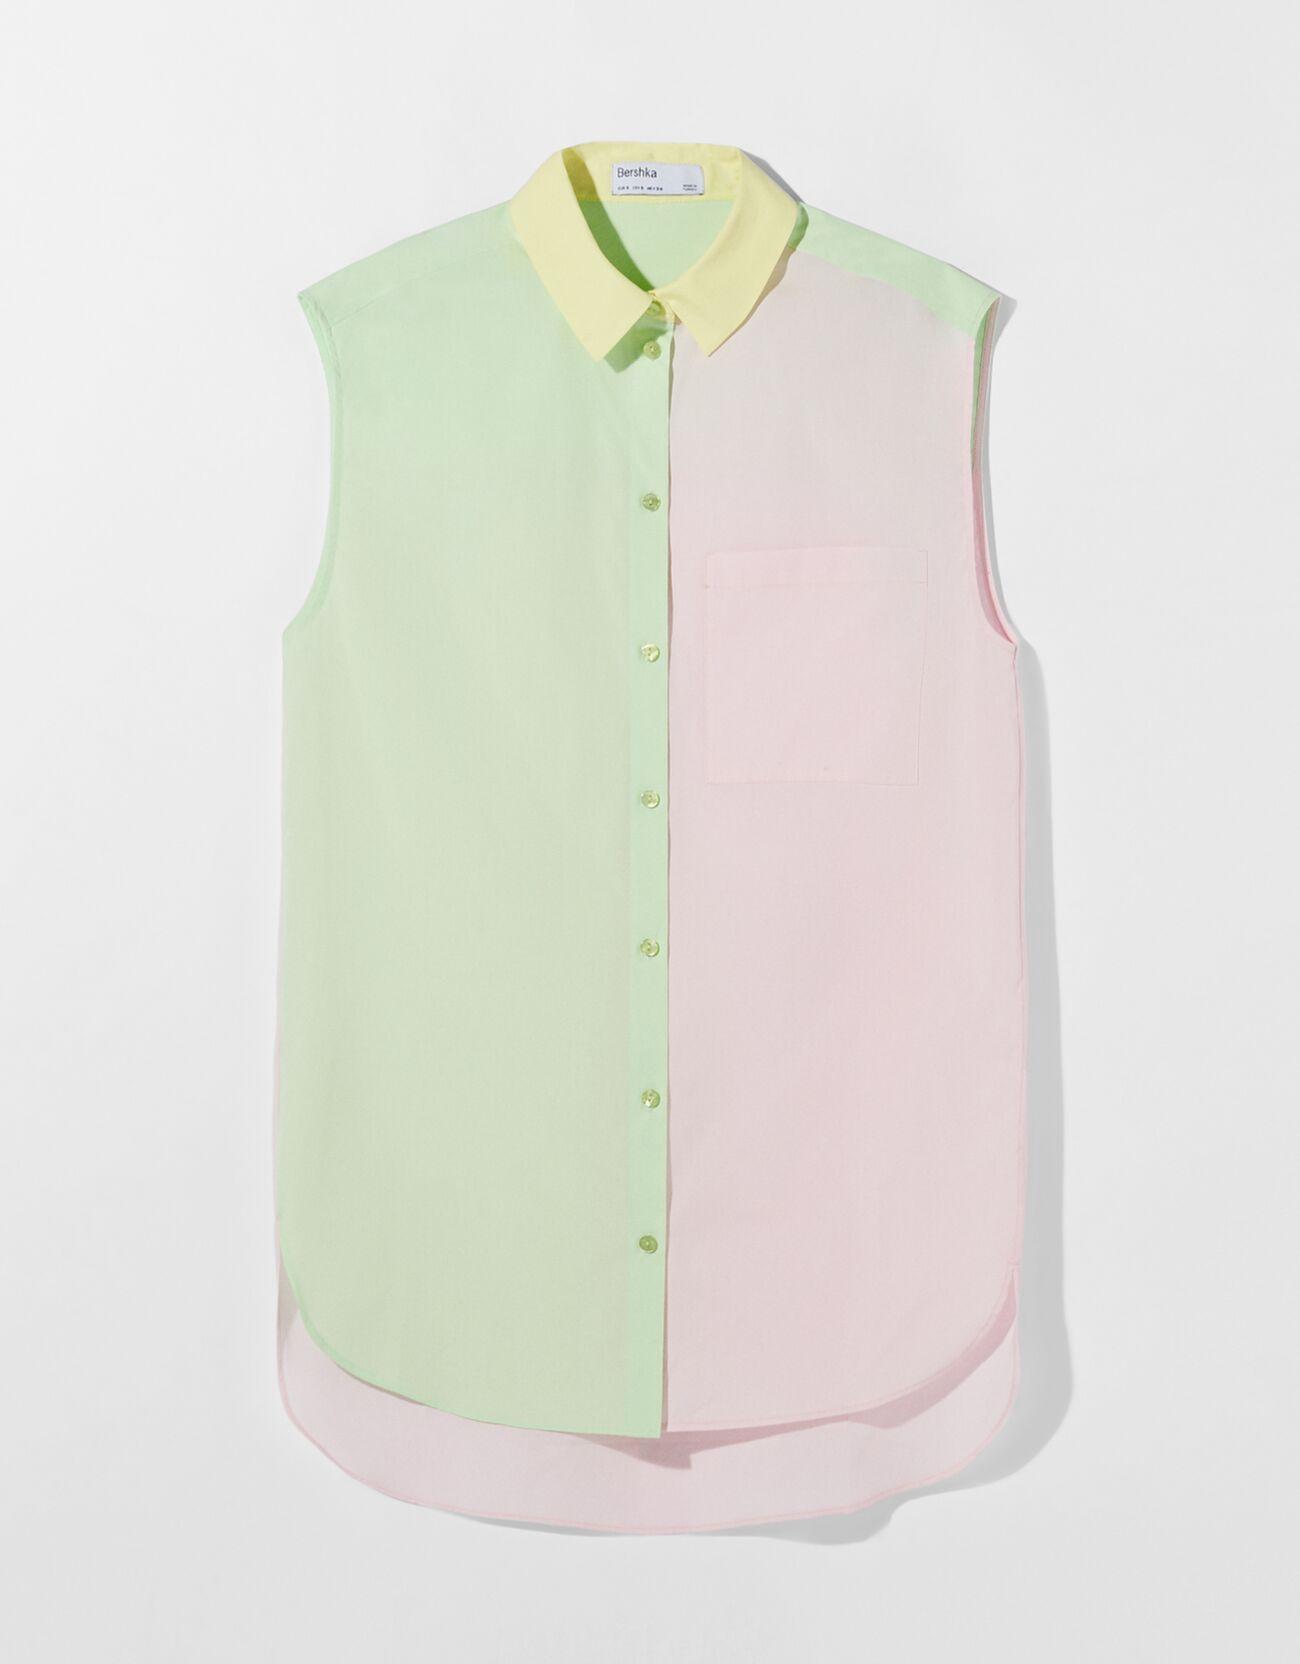 Camisa sin mangas oversize popelín color block.